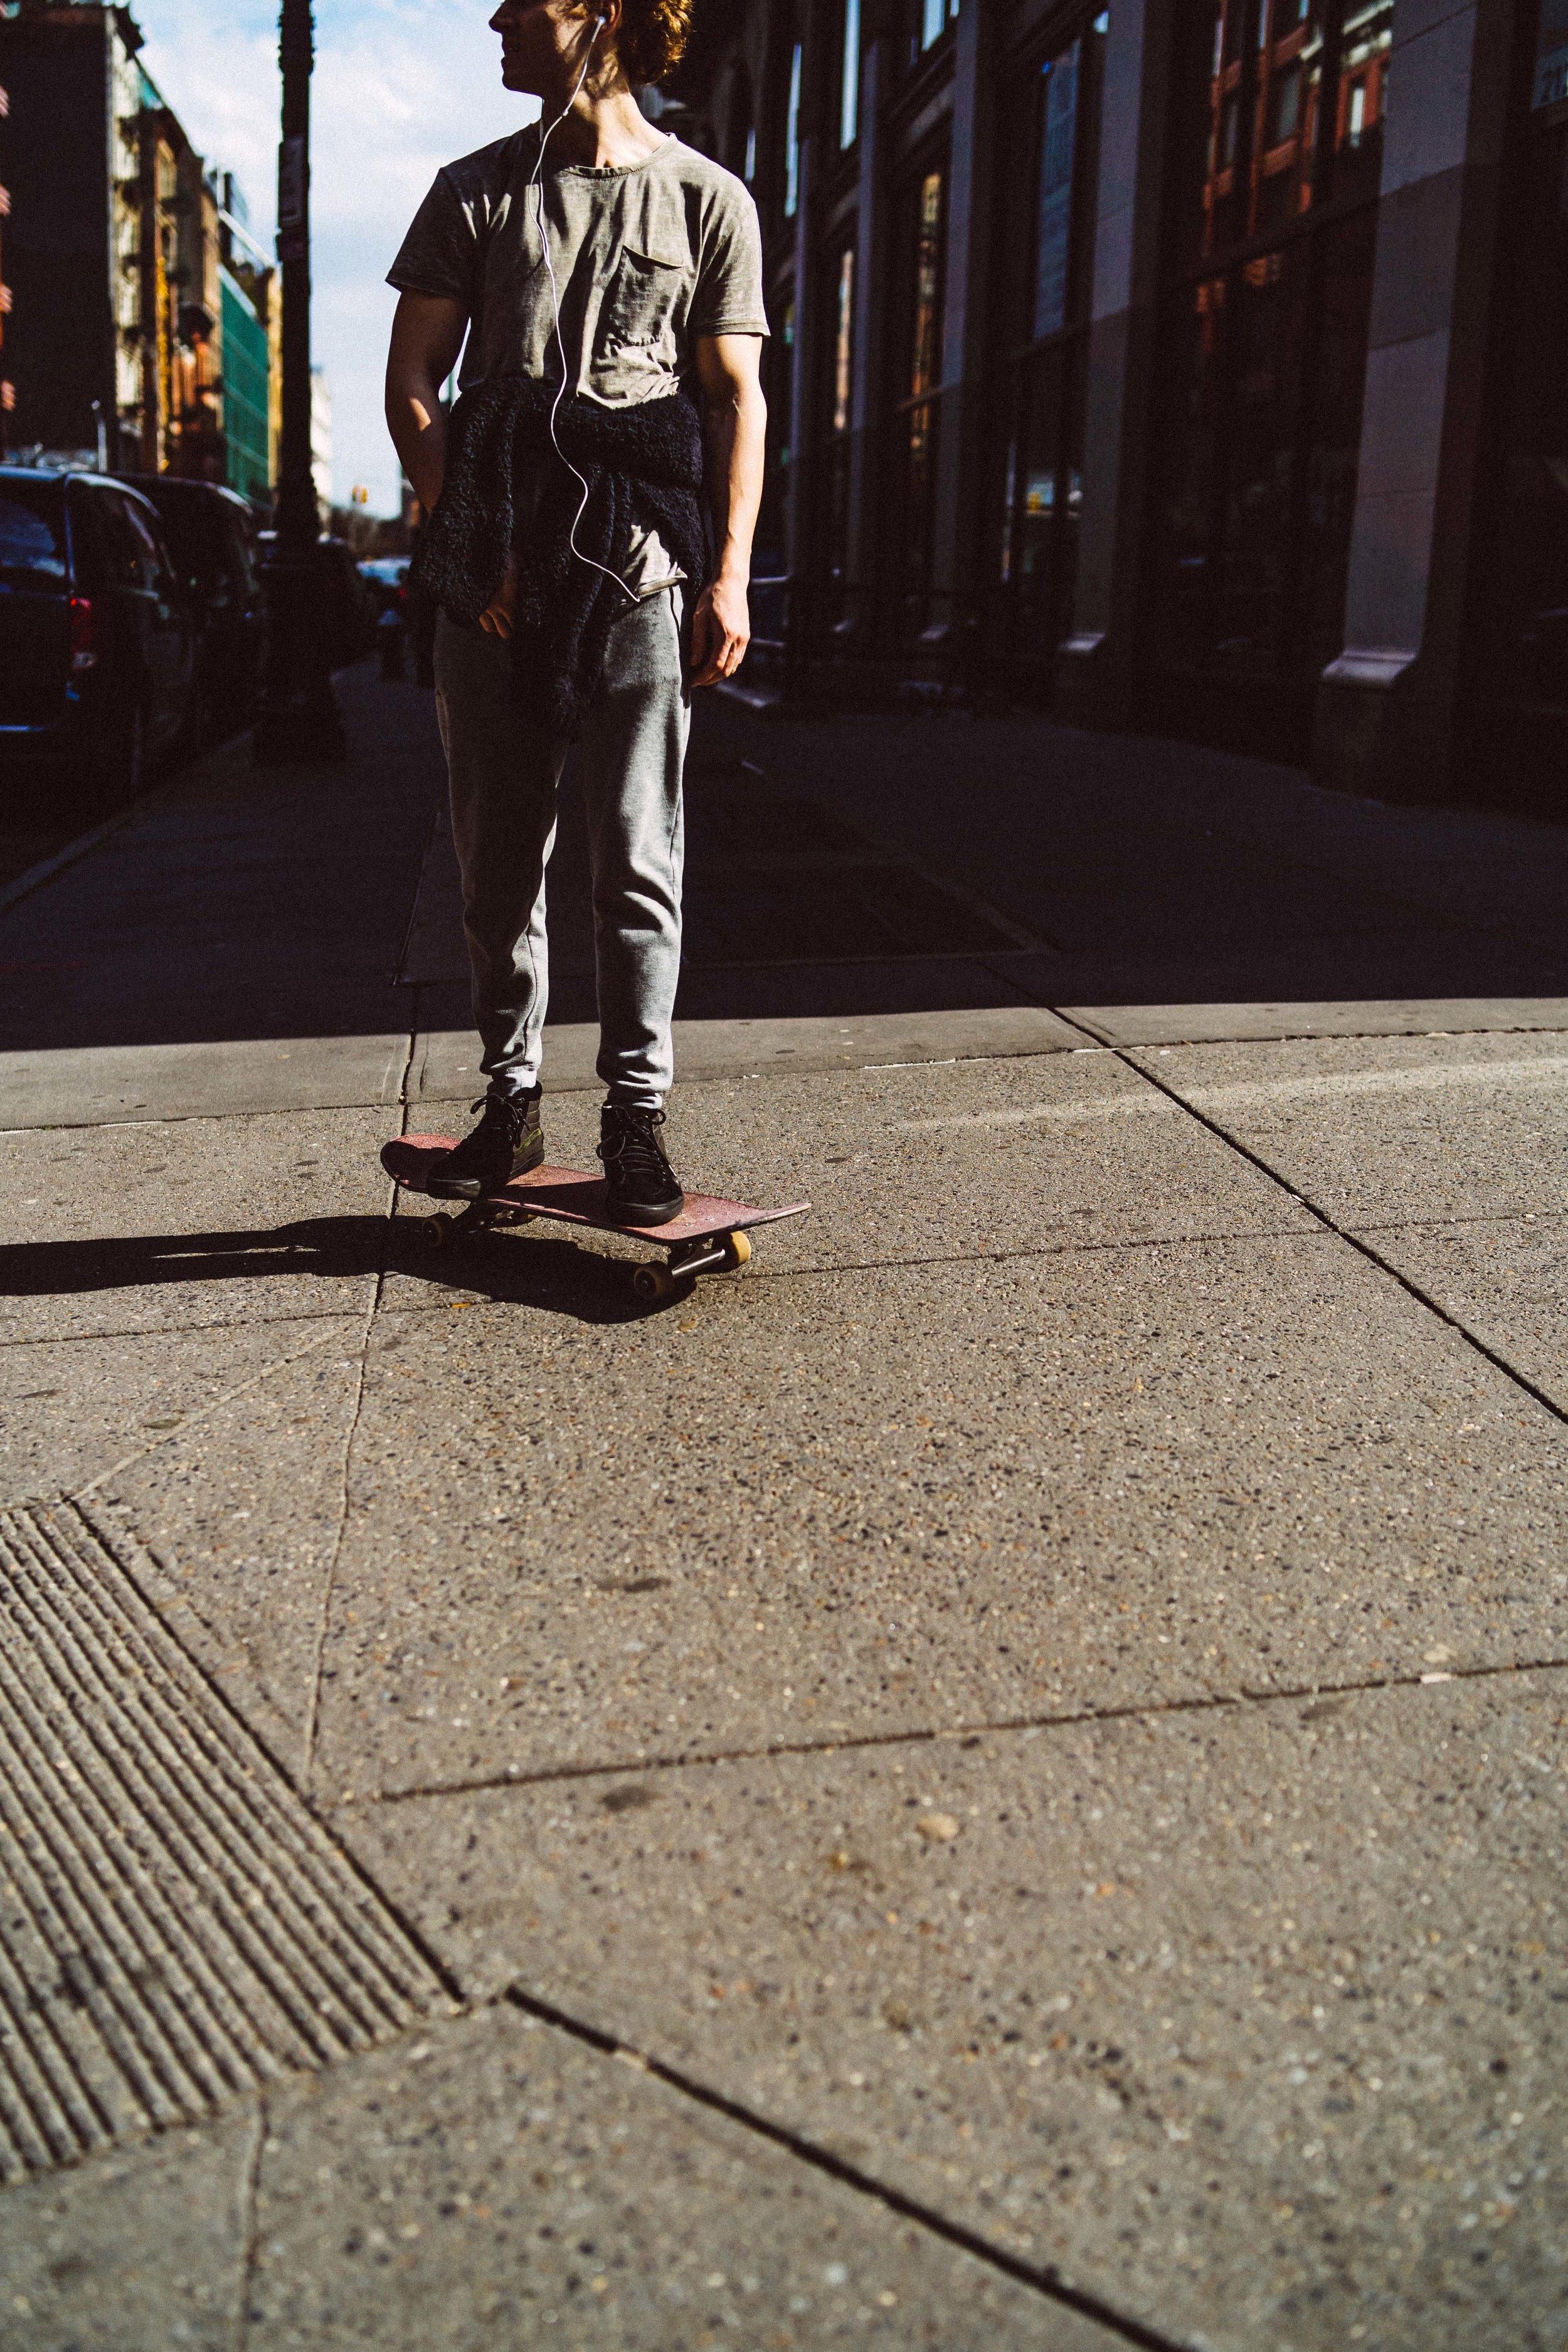 newyork-sony-102590.jpg